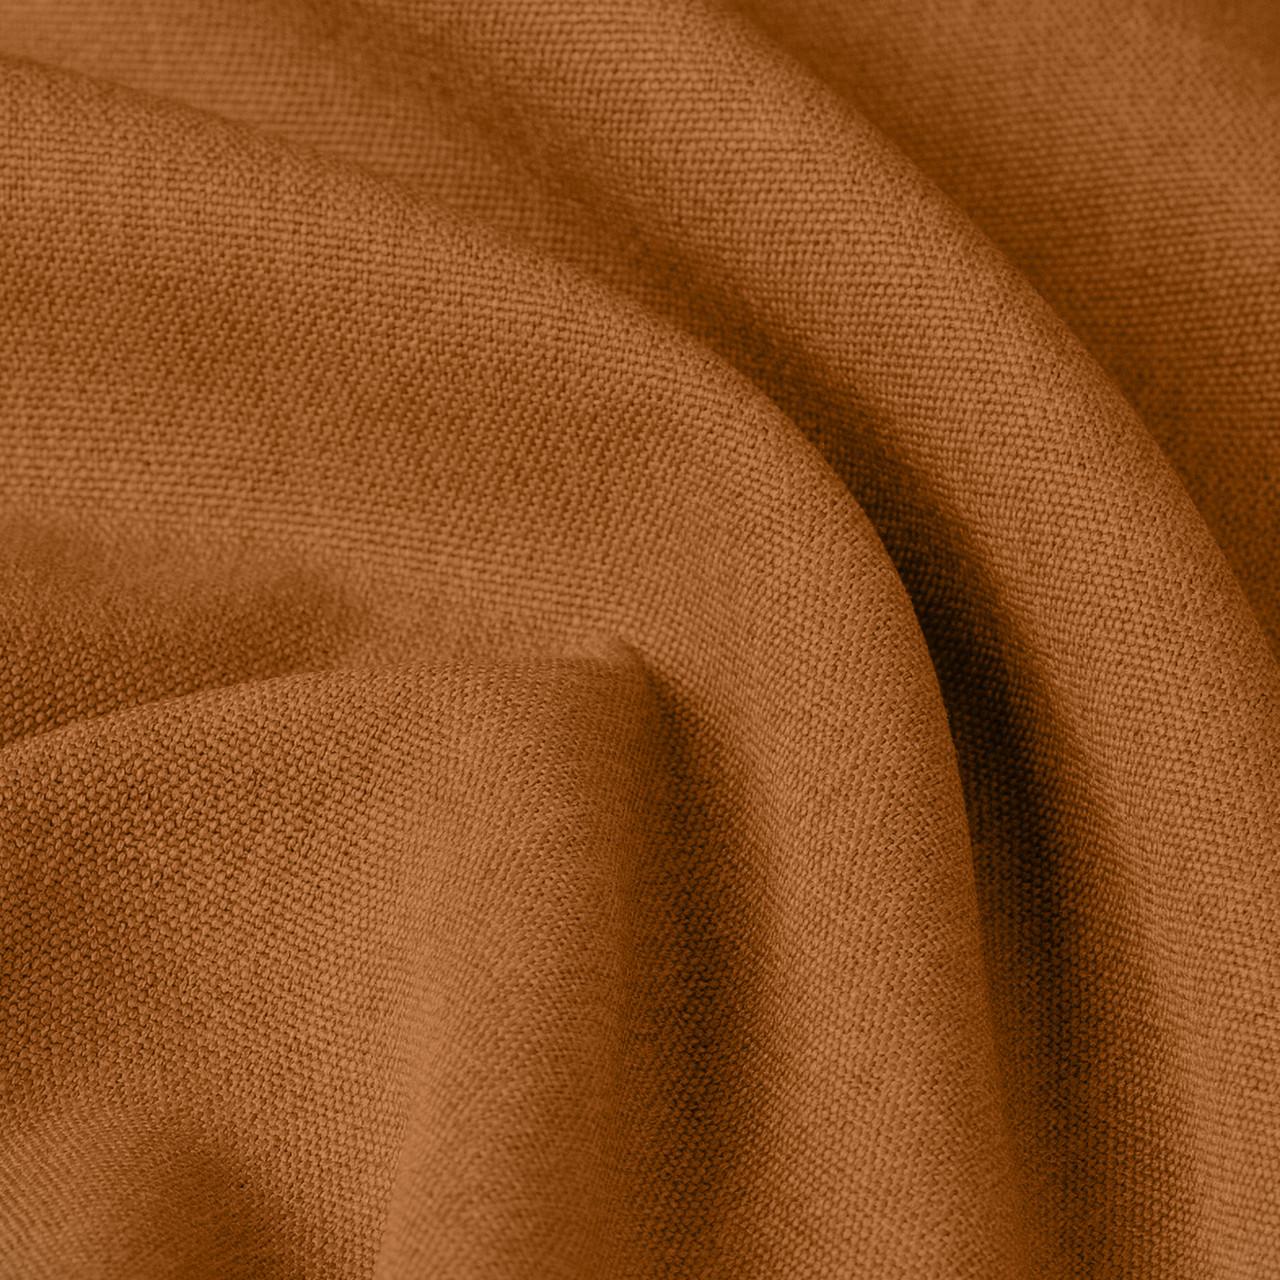 Тканина для штор Блекаут фактурний помаранчевий Туреччина 124000v5 сонцезахисна, затемнююча.